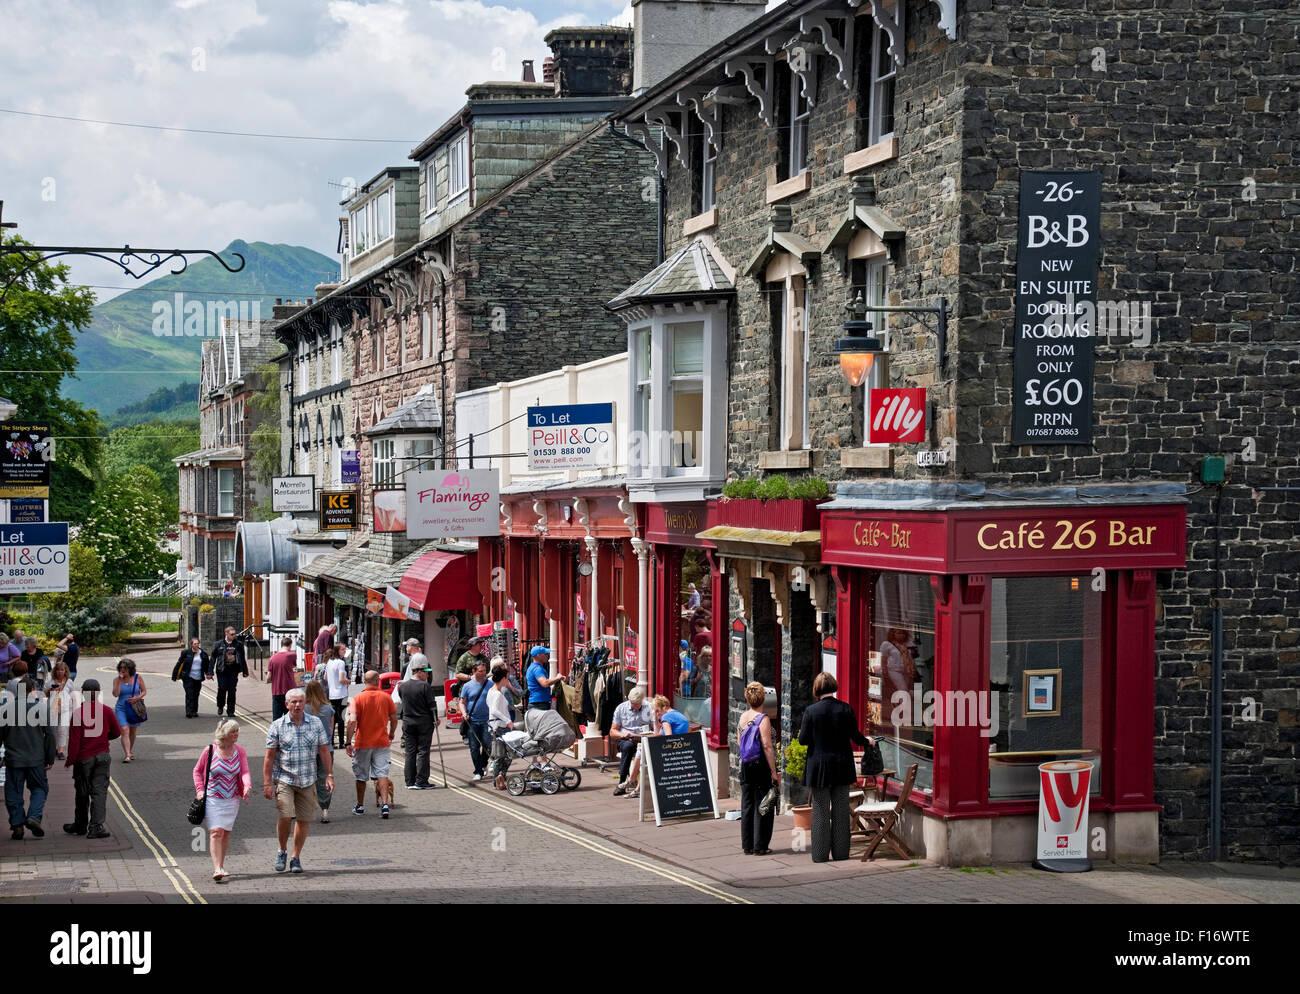 Shops along Lake Road Keswick Cumbria England UK United Kingdom GB Great Britain - Stock Image